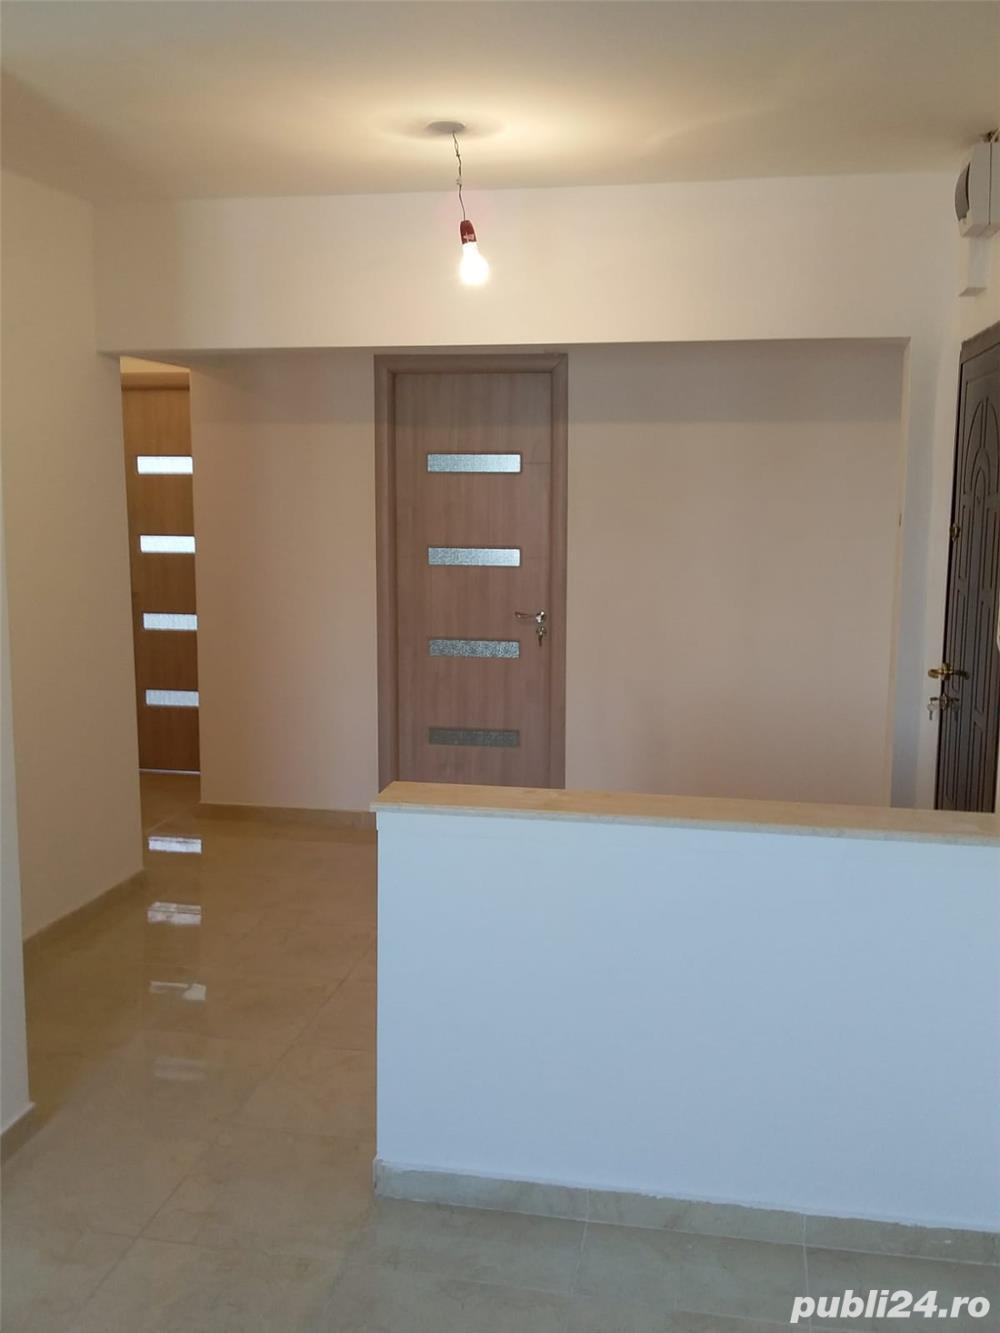 Comision 0 % INEL II -apartament renovat cu centrala